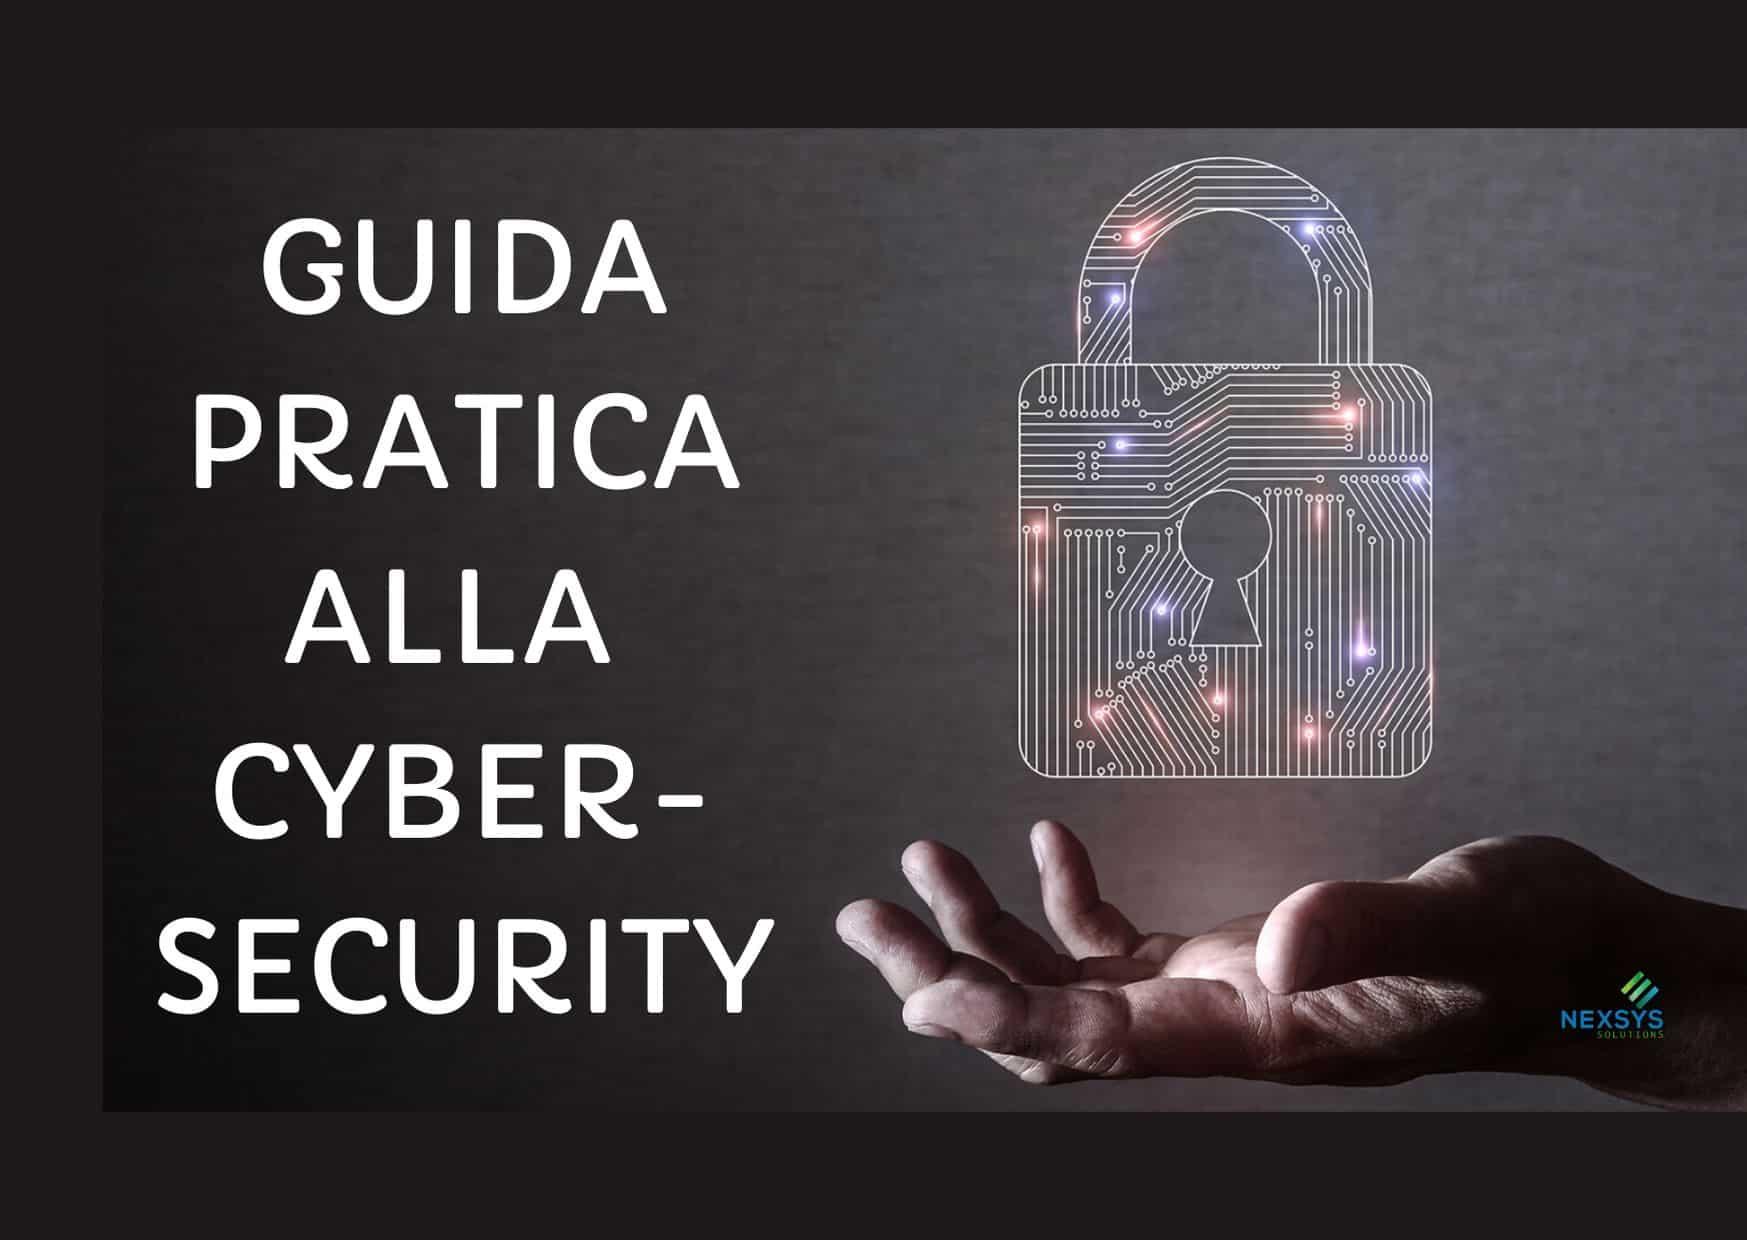 Guida Cybersecurity